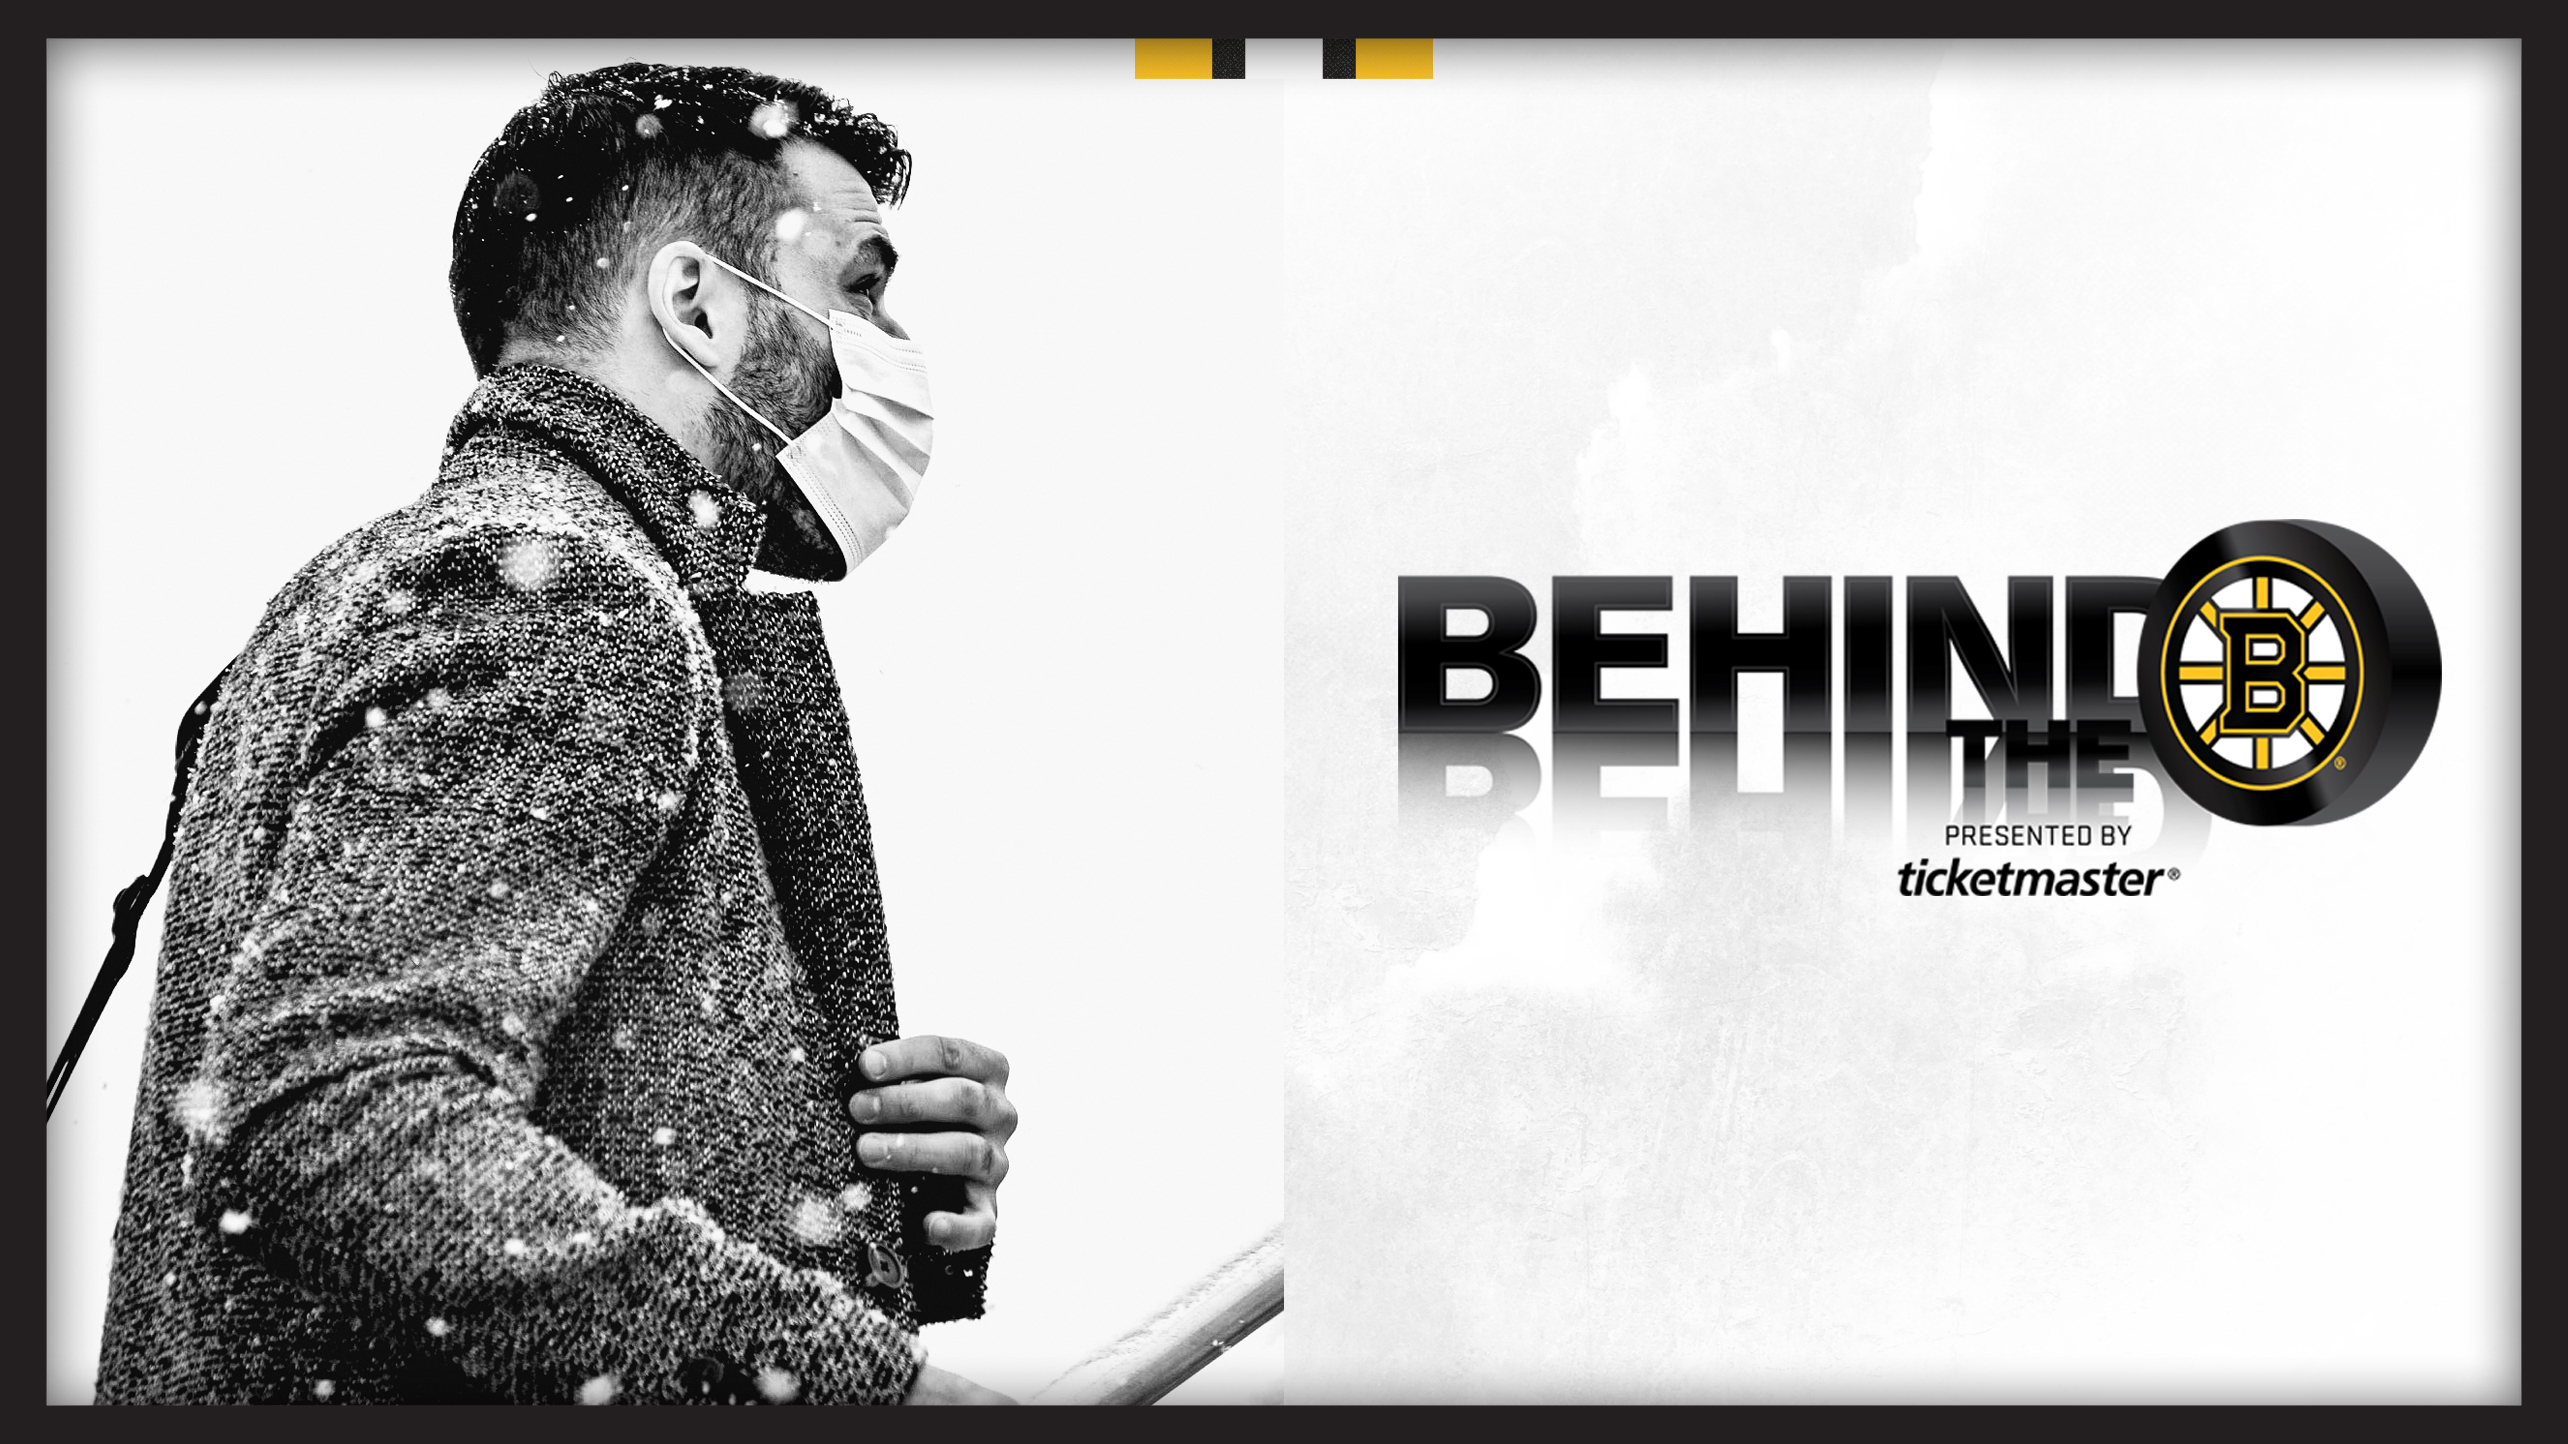 Behind the B: Season 8, Episode 3